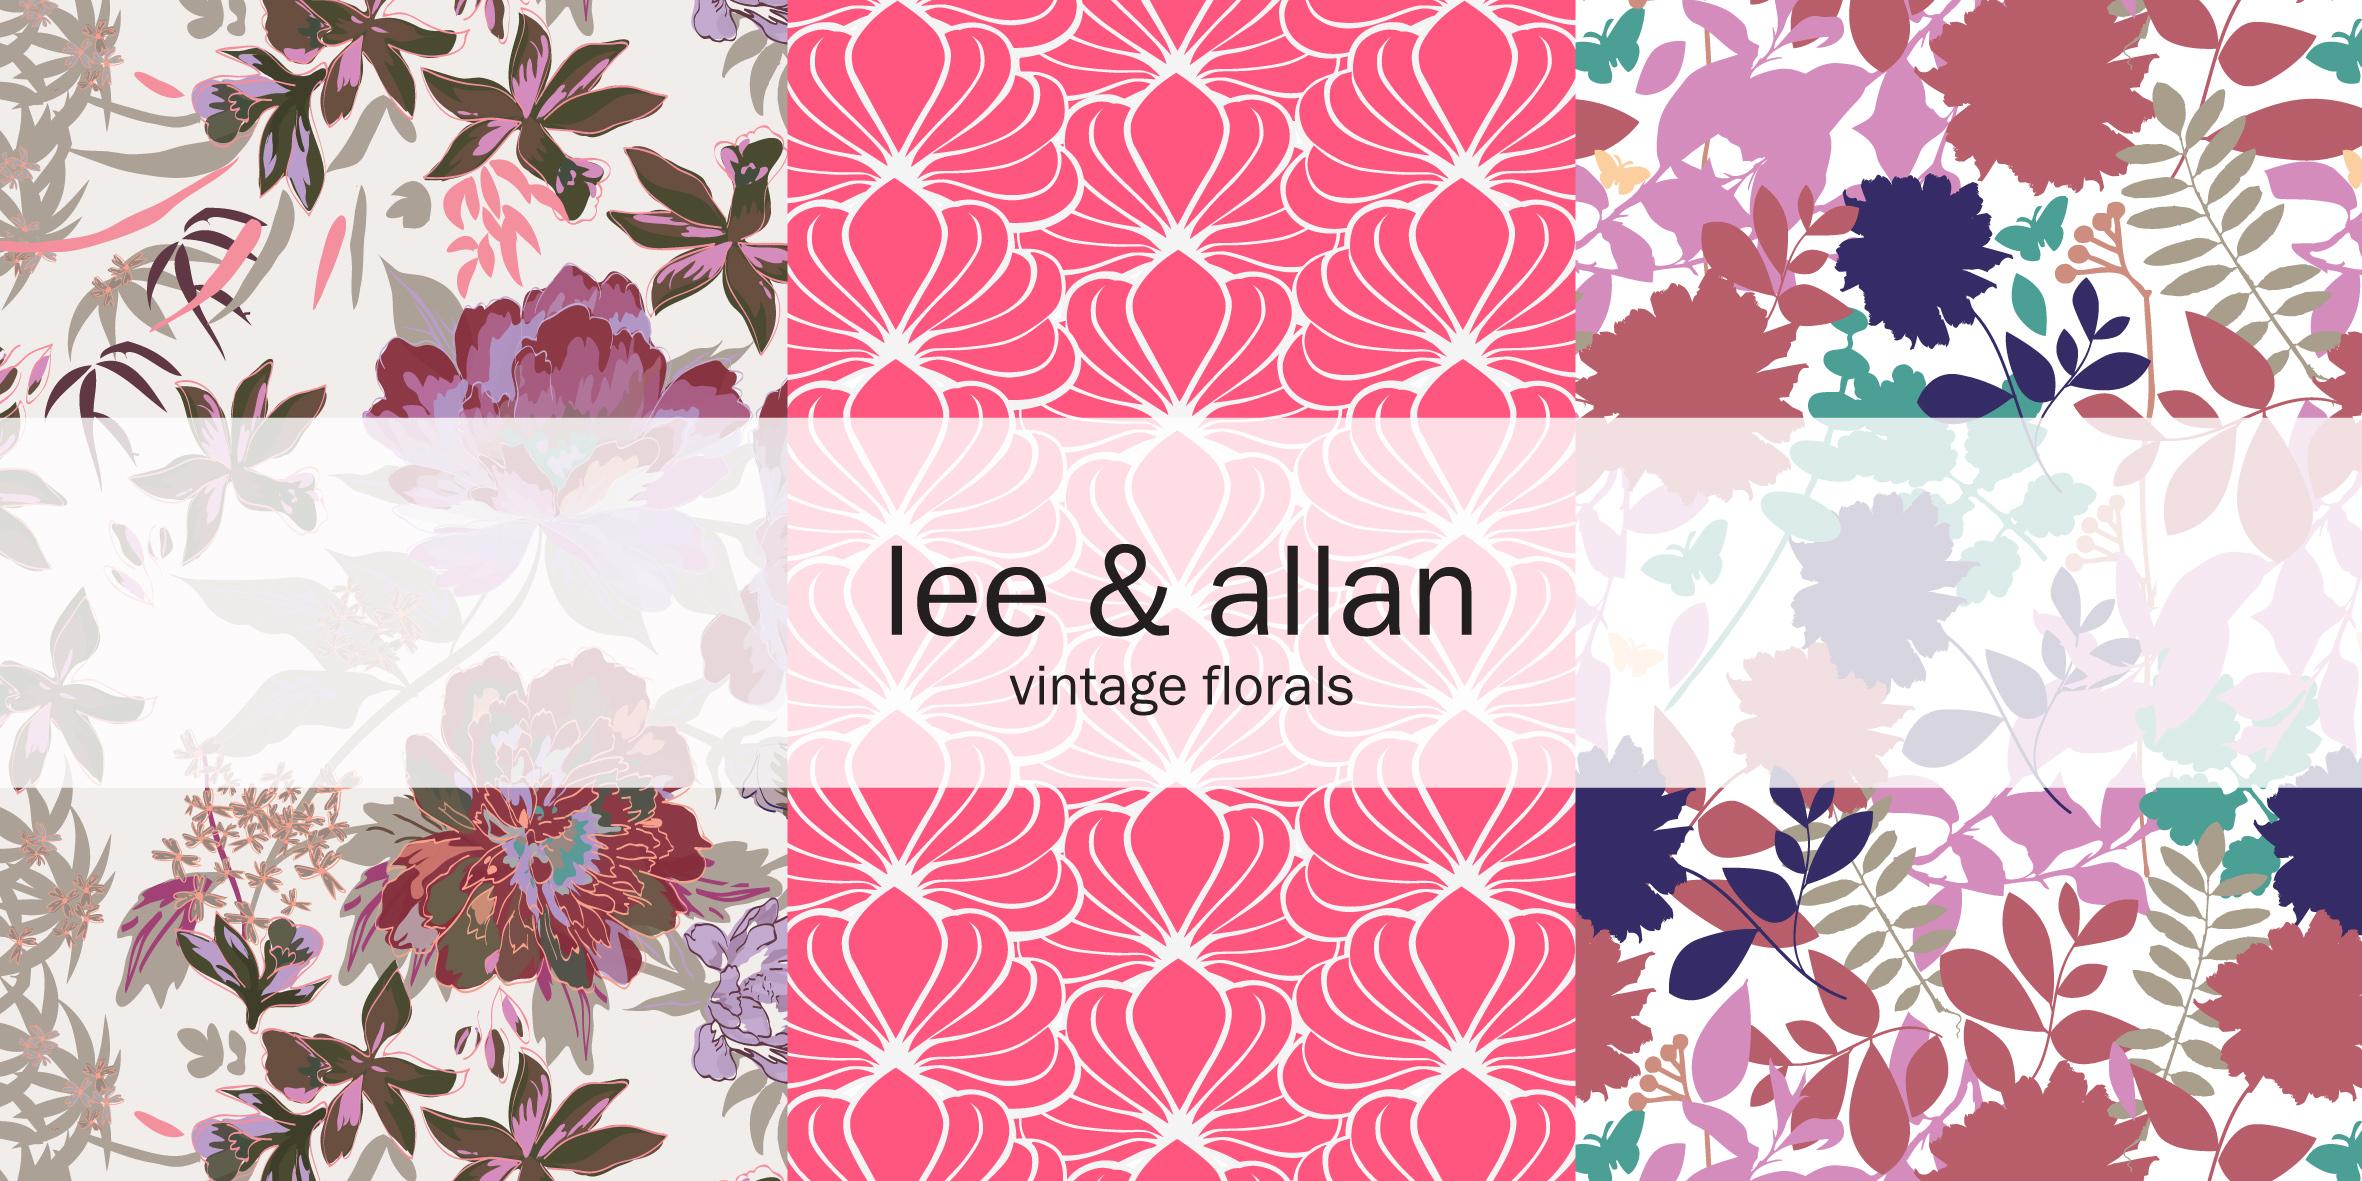 vintage floral pattern swatches.jpg